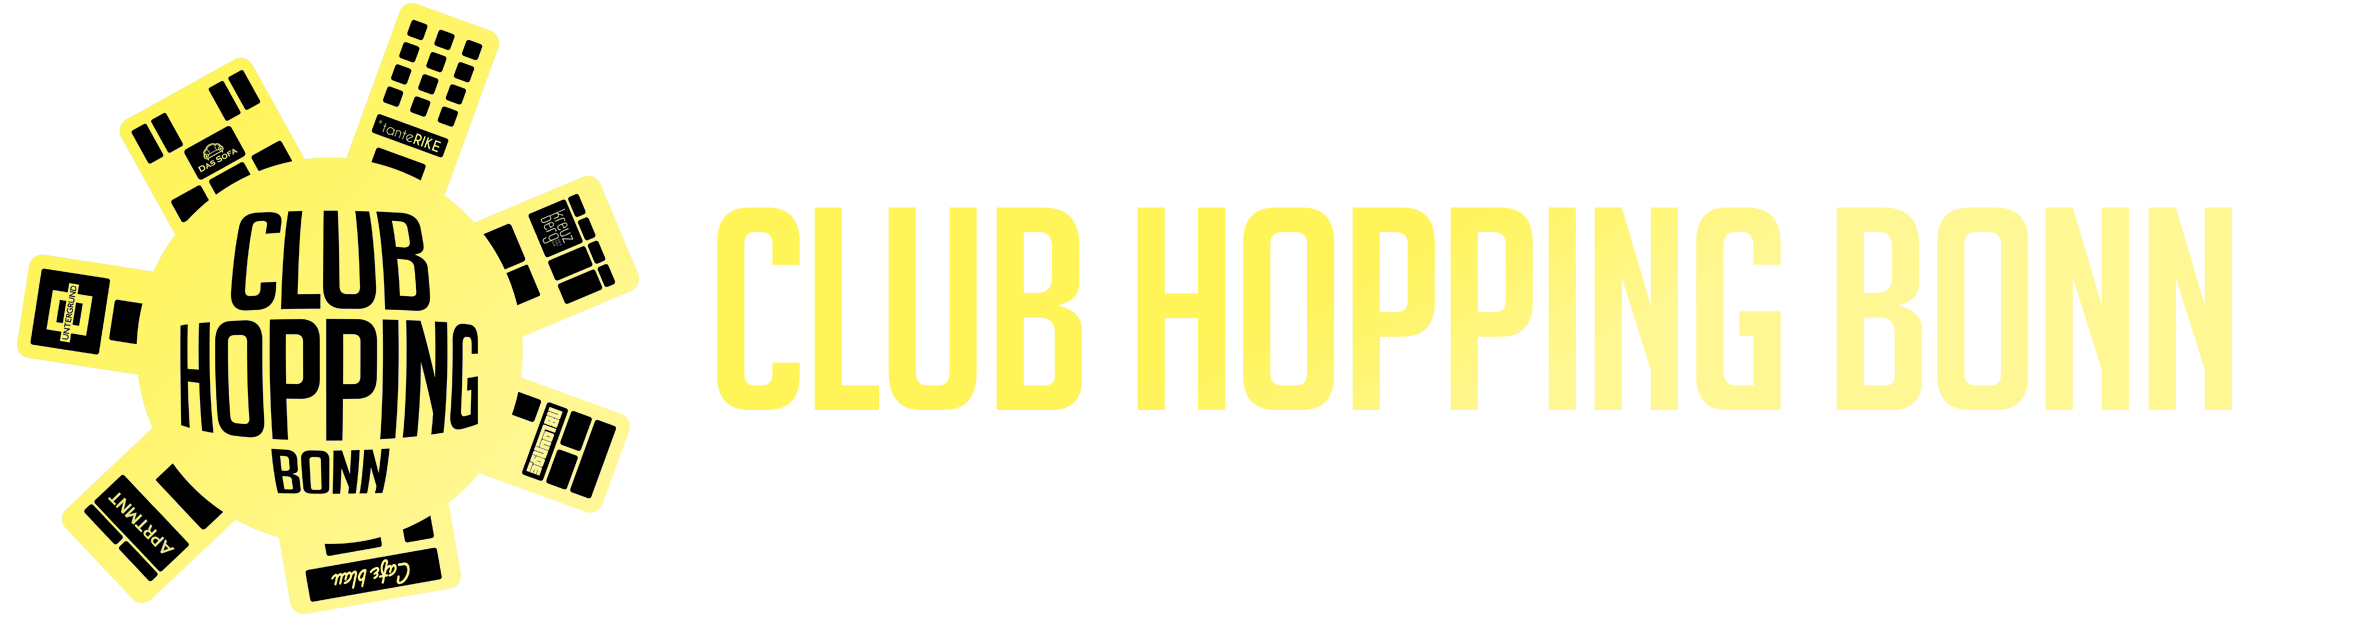 Clubhoppingbonn